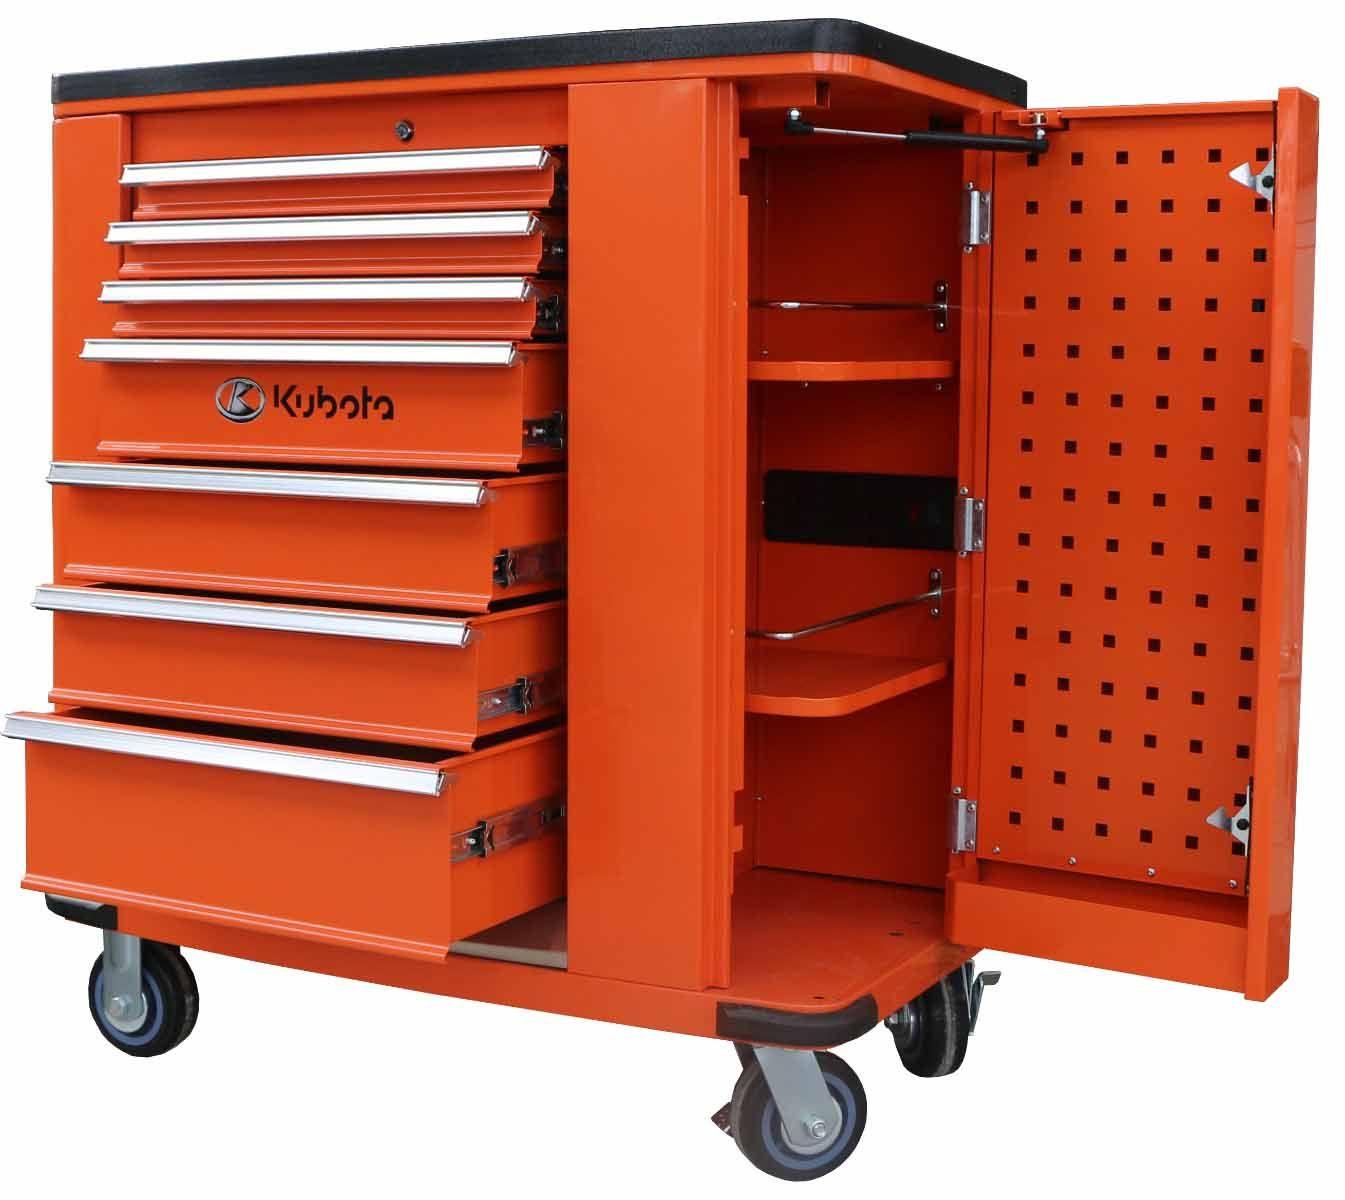 Kubota Professional rolling tool chest